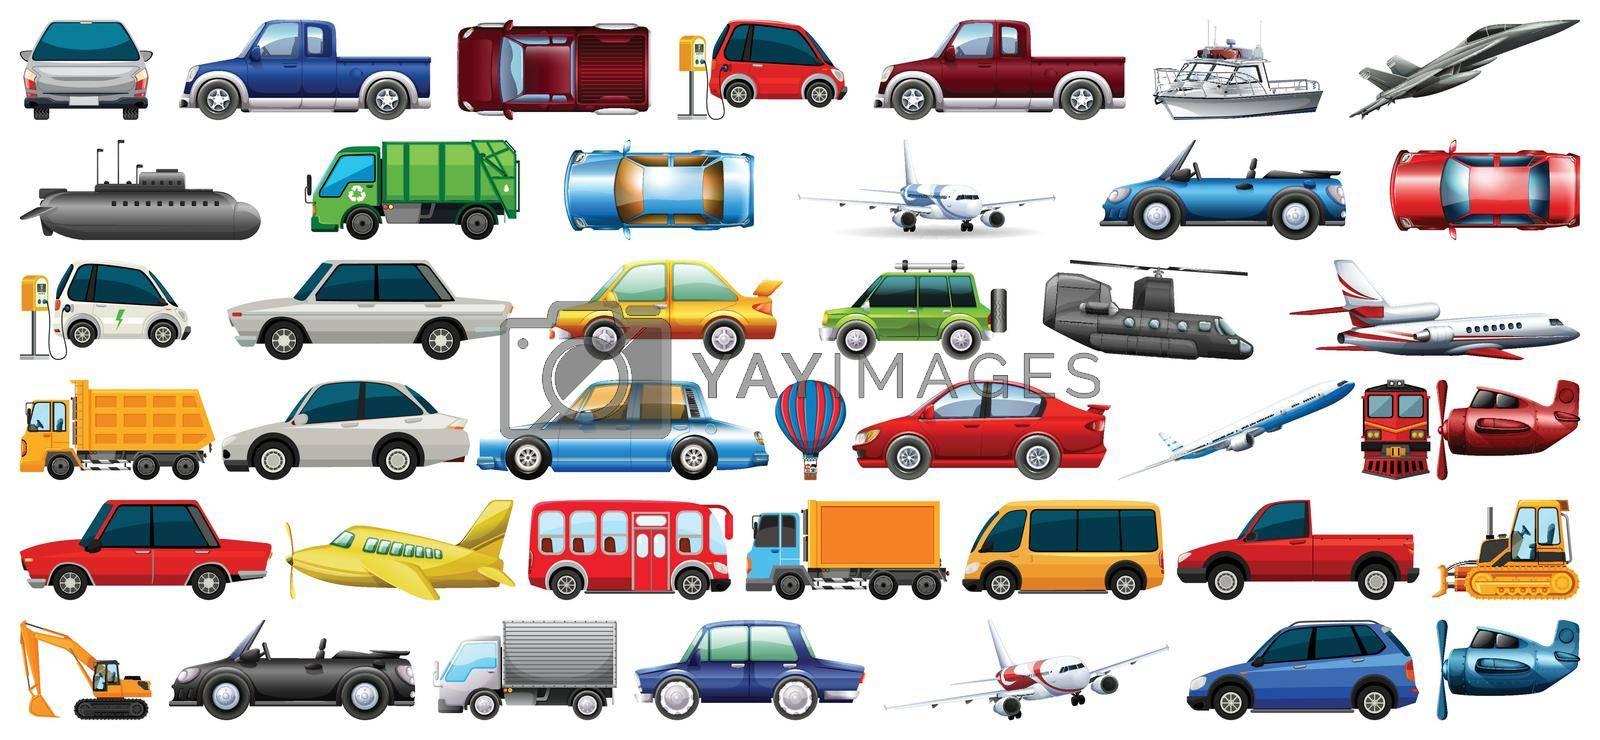 Set of transportation vehicle illustration